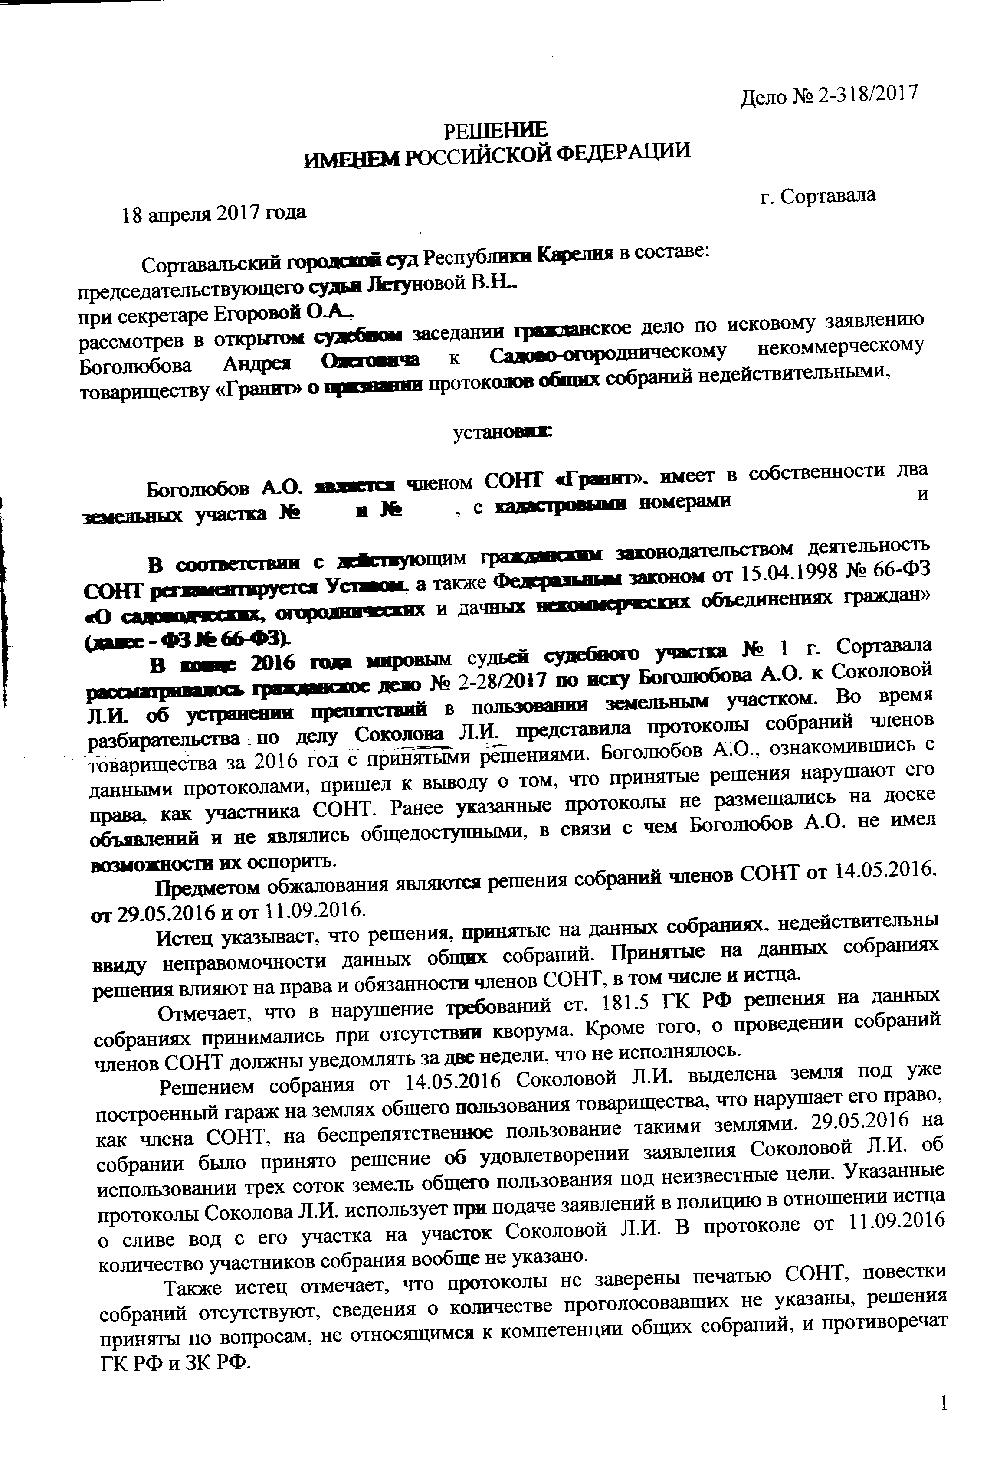 https://sontgranit.ru/forum/img/sokol/решение2.png